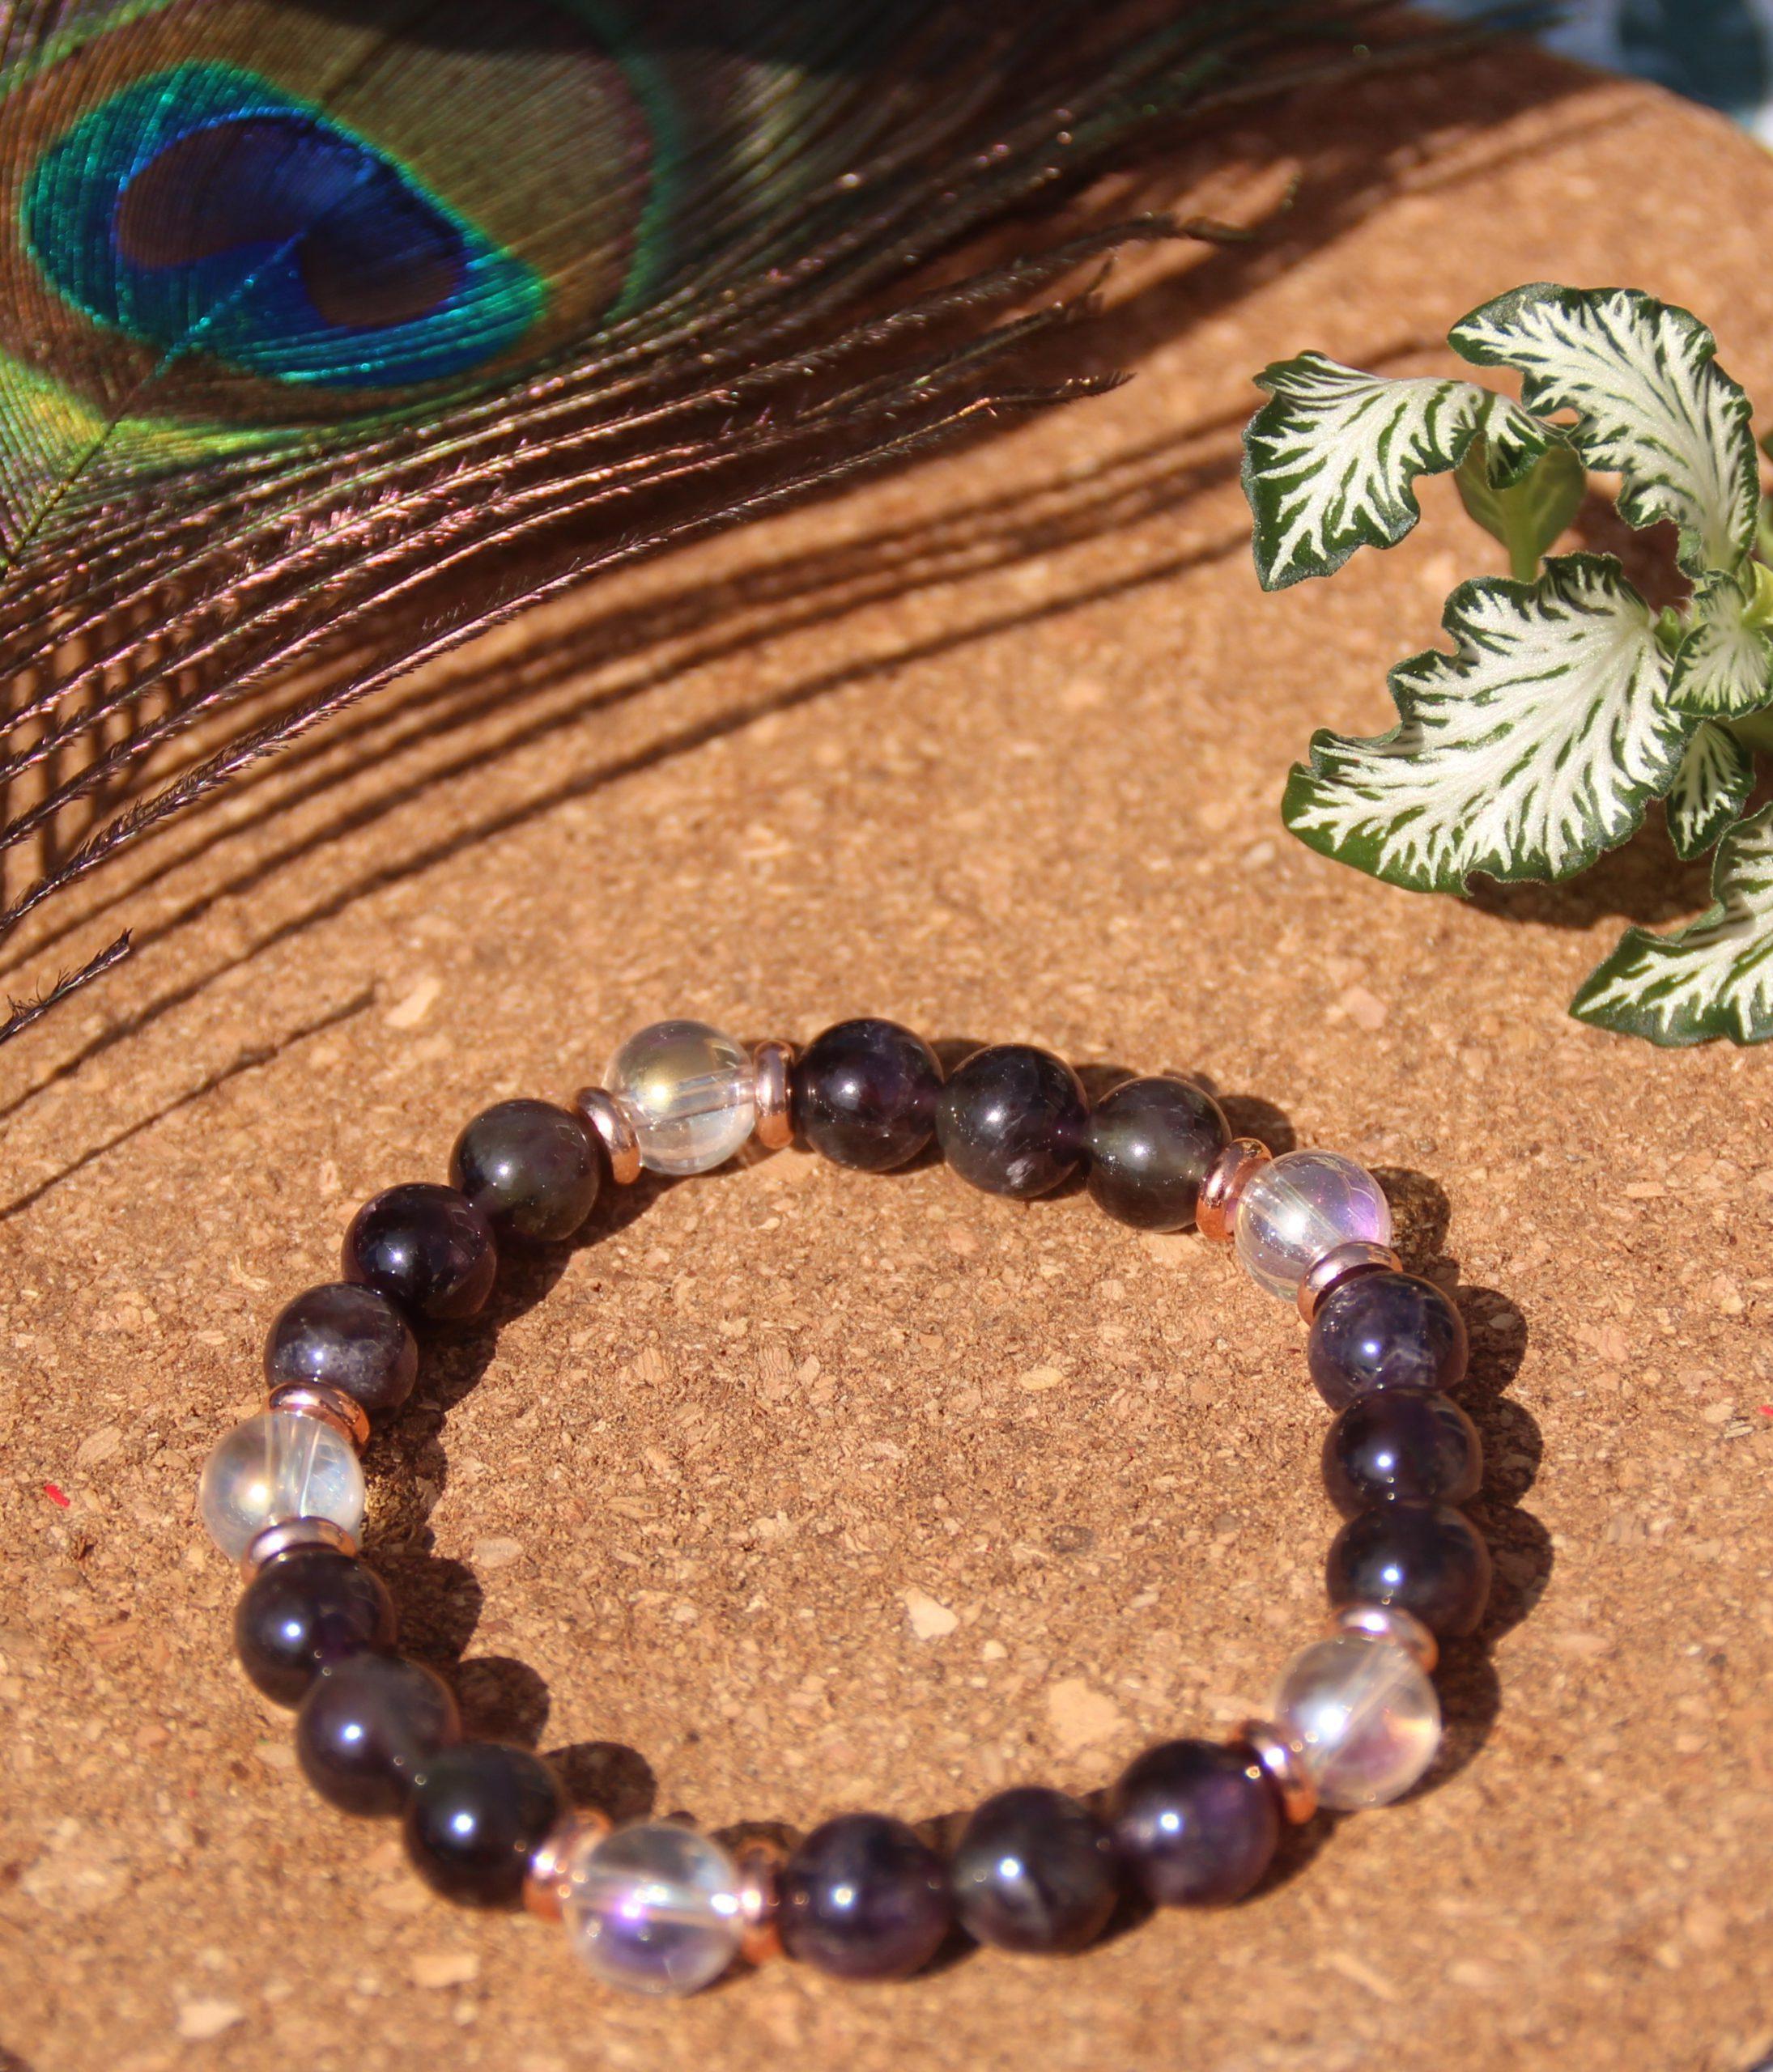 bracelet-pierre-naturelle-quartz-aqua-aura-et-amethyste-fabrication-artisanale-shiva-esoterisme-halluin-menen-lille-france